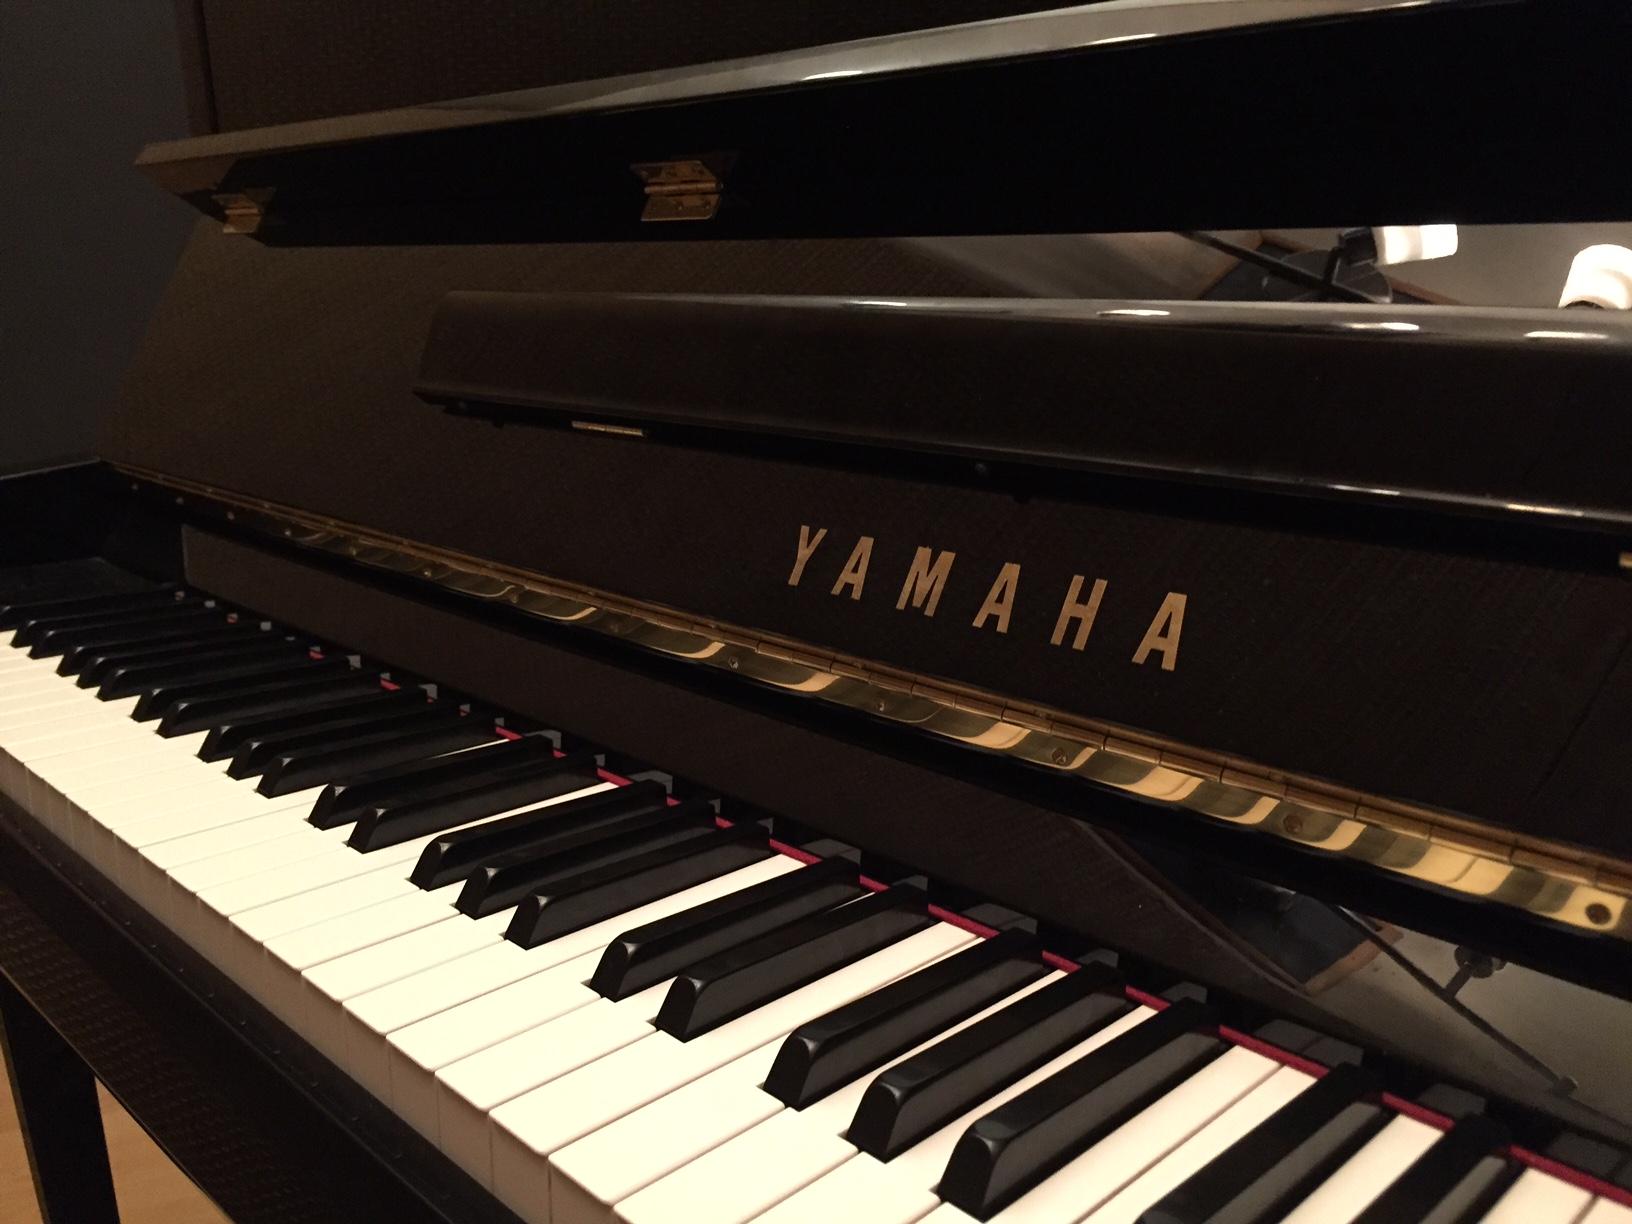 Piano Yamaha B3